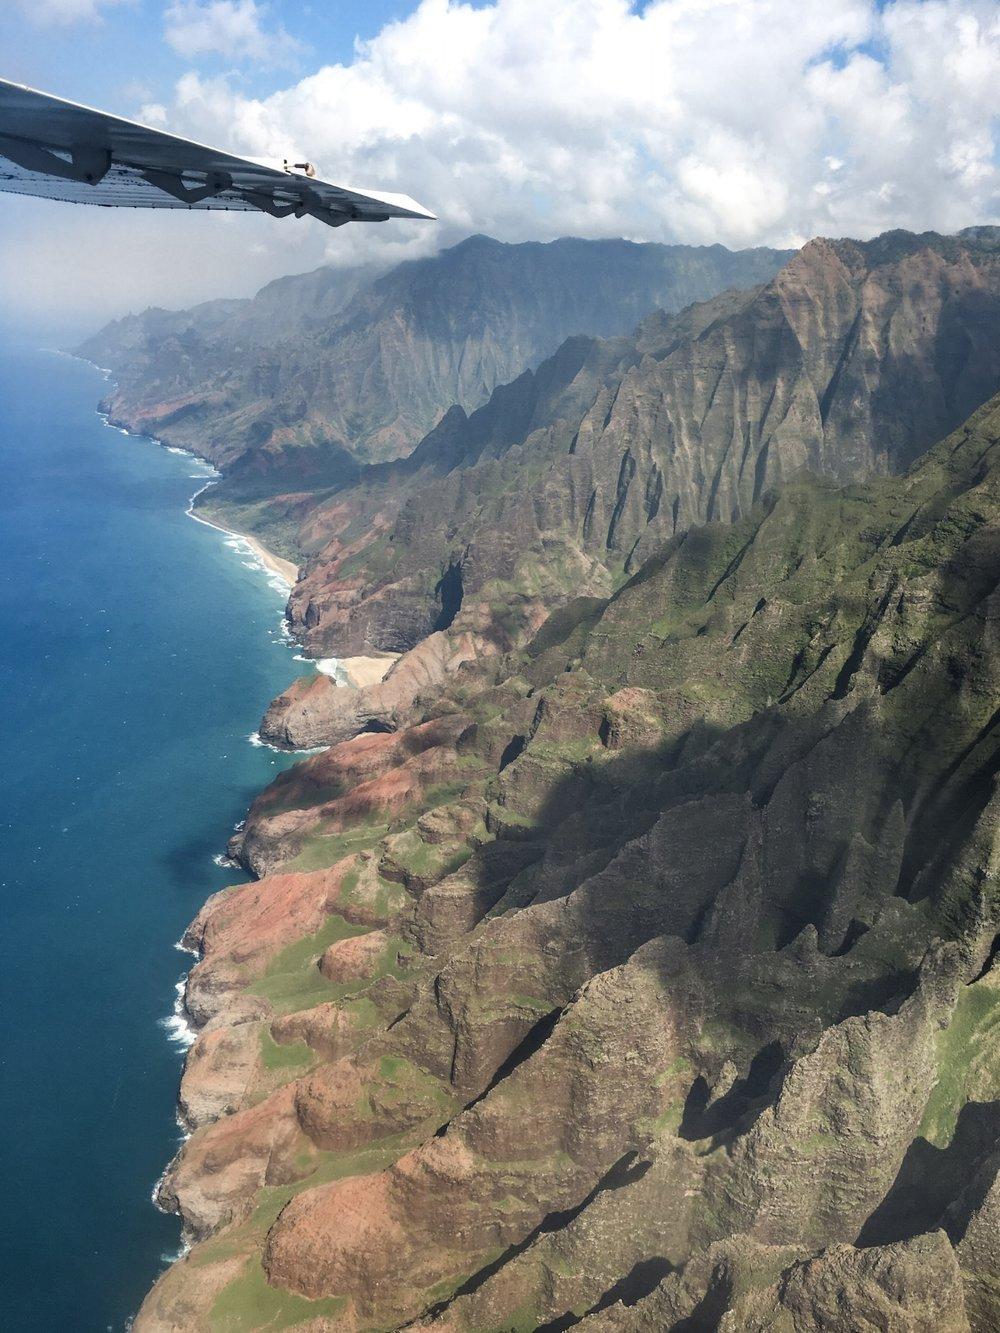 FLY OVER HAWAII'S DRAMATIC COAST